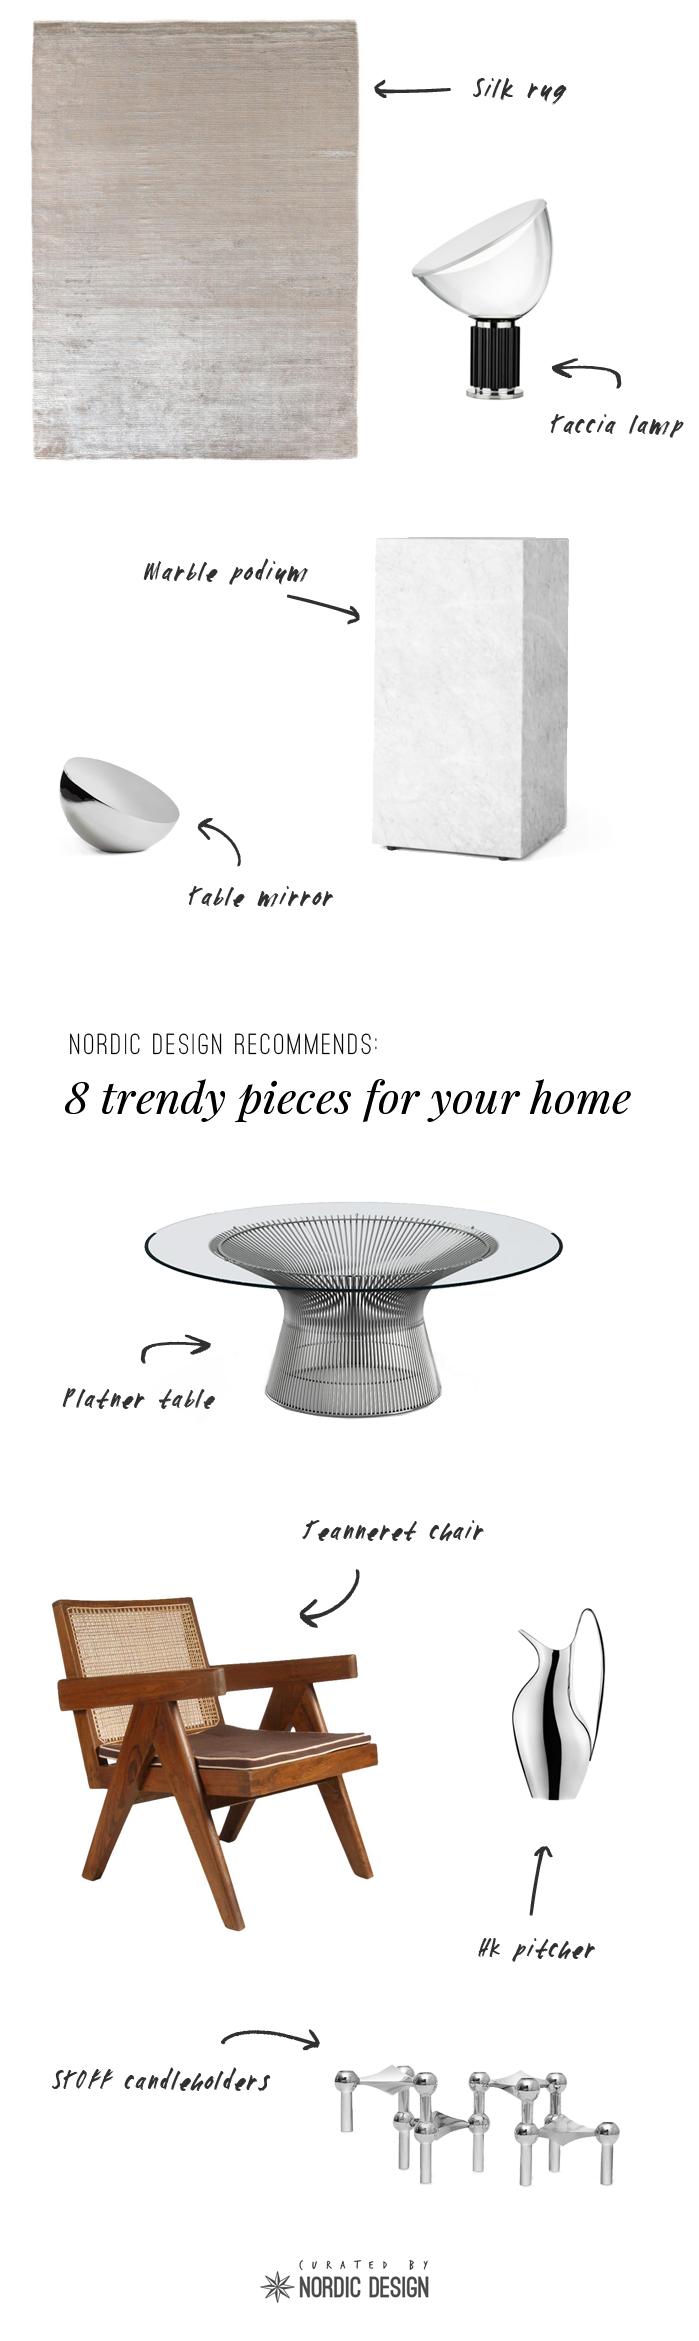 Popular-Design-pieces-NordicDesign